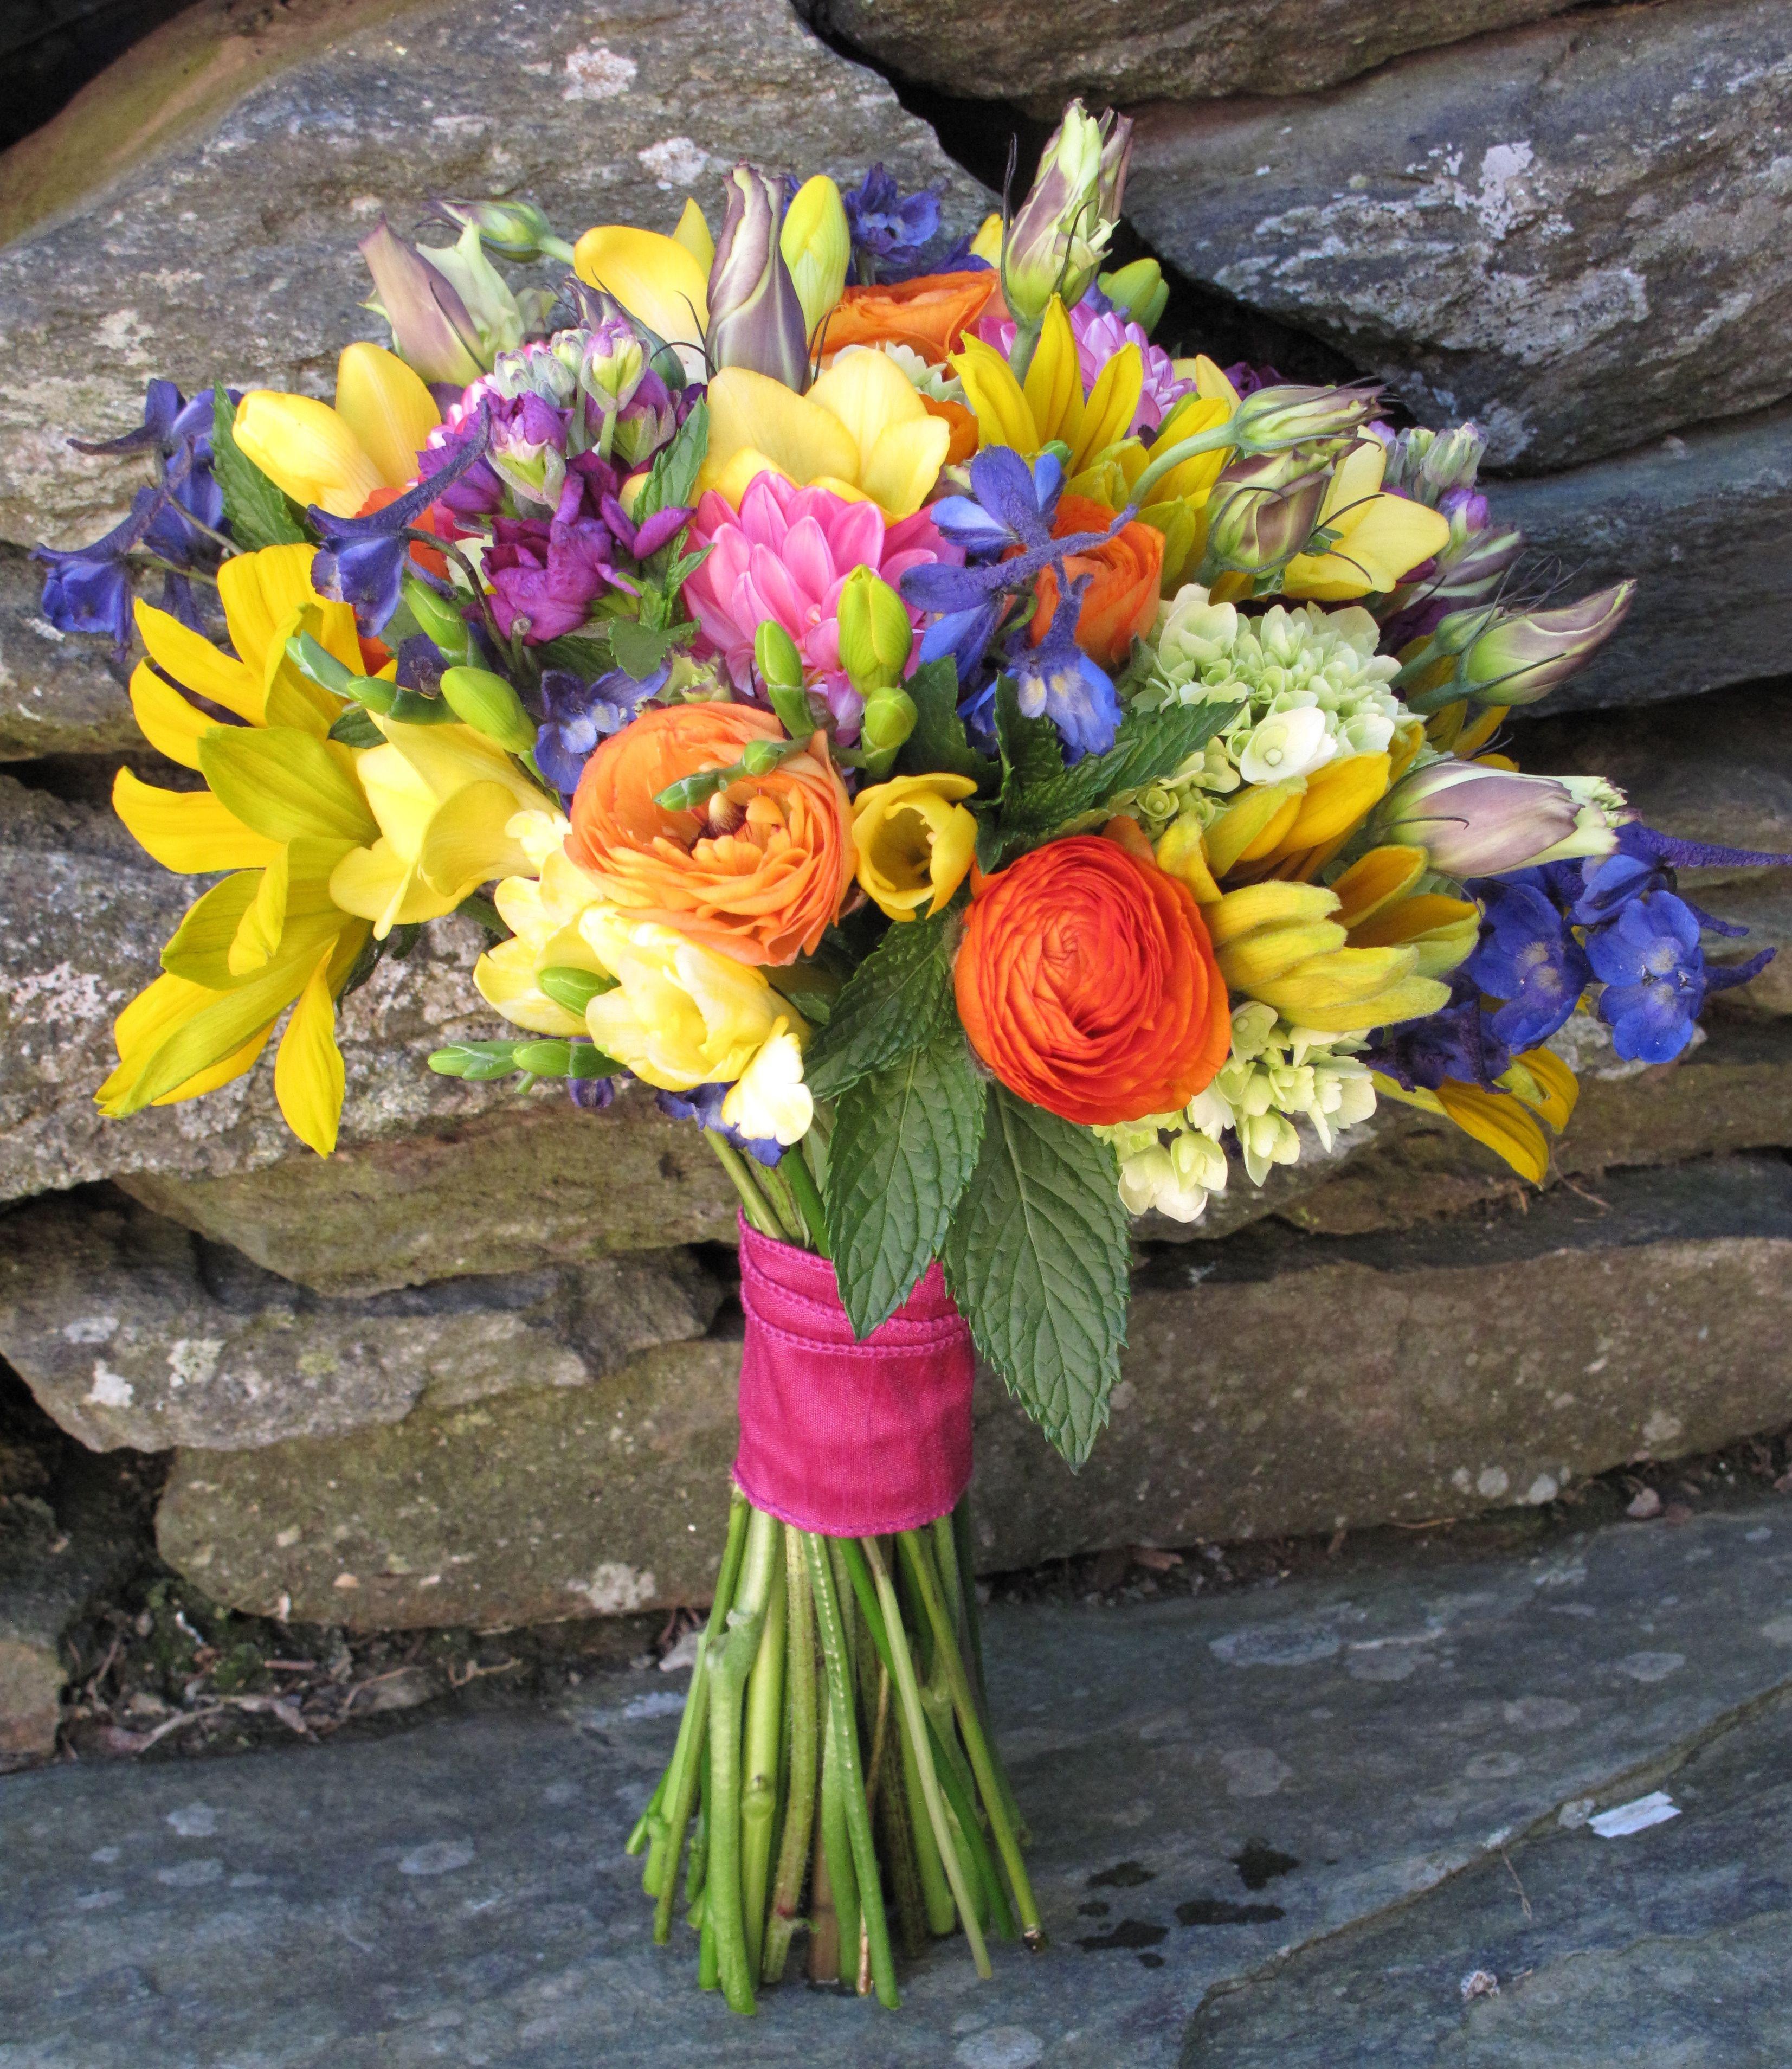 Wild Flowers For Weddings: Flower Bouquet Wedding, Bright